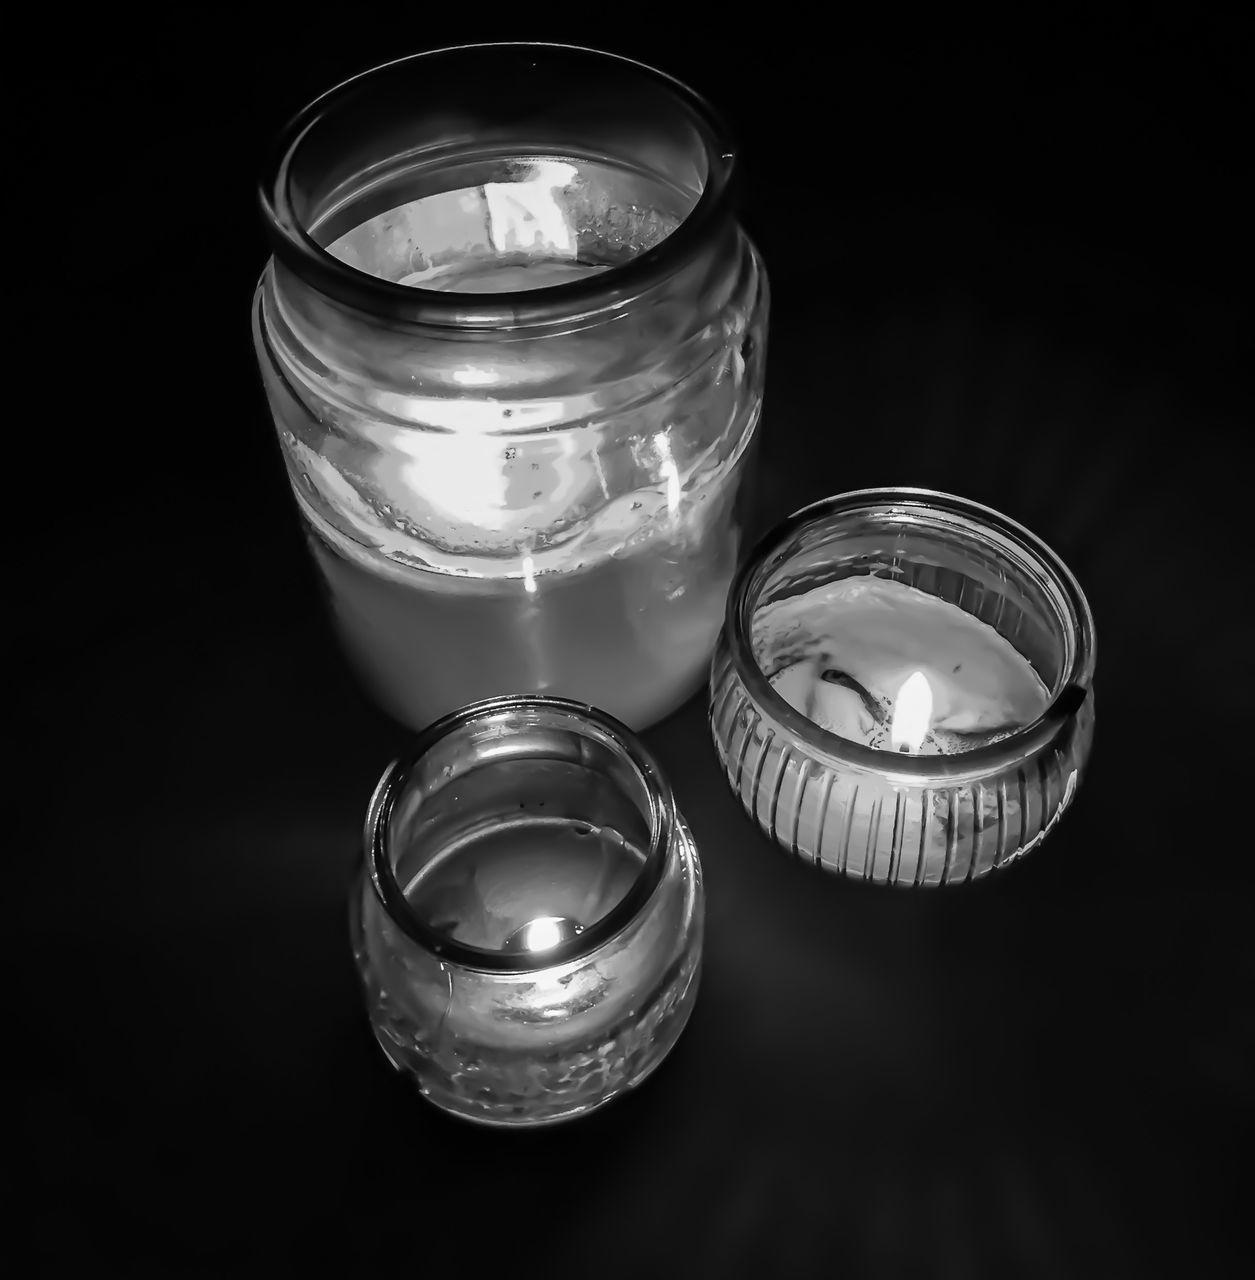 candle, tea light, no people, flame, burning, studio shot, lid, close-up, indoors, black background, day